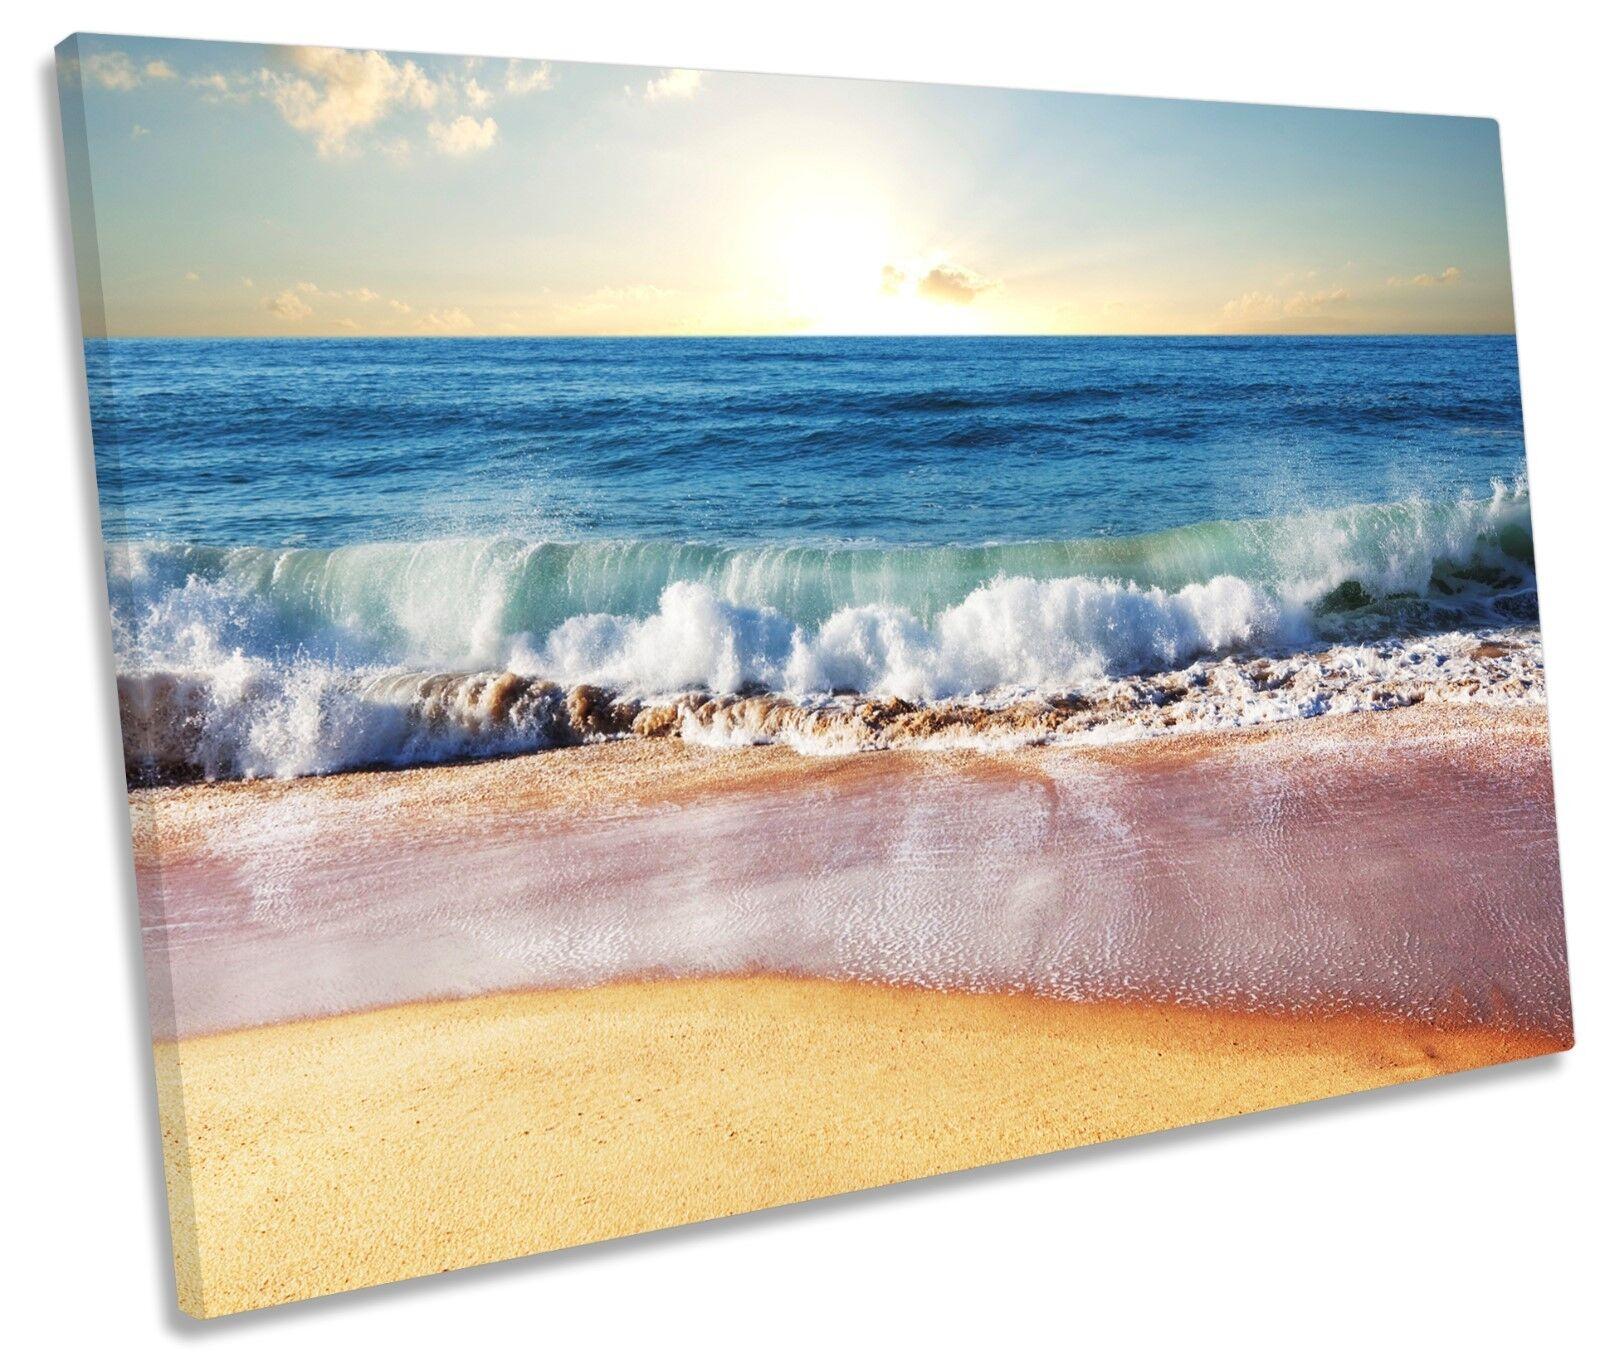 Sandy Beach Seascape CANVAS WALL ART SINGLE Picture Print